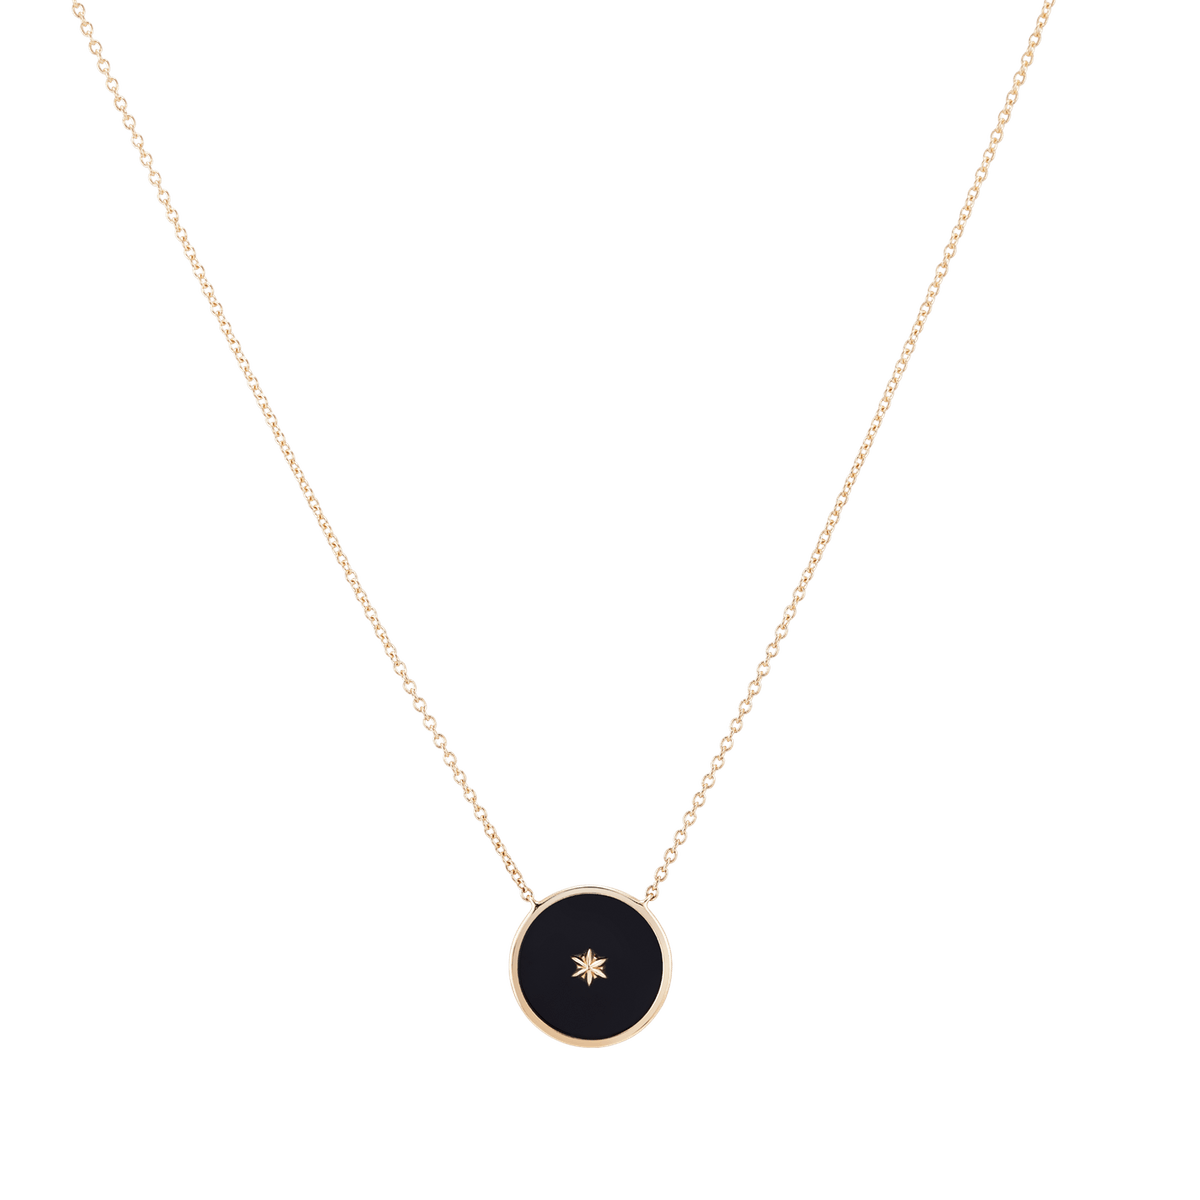 Black Onyx Medallion